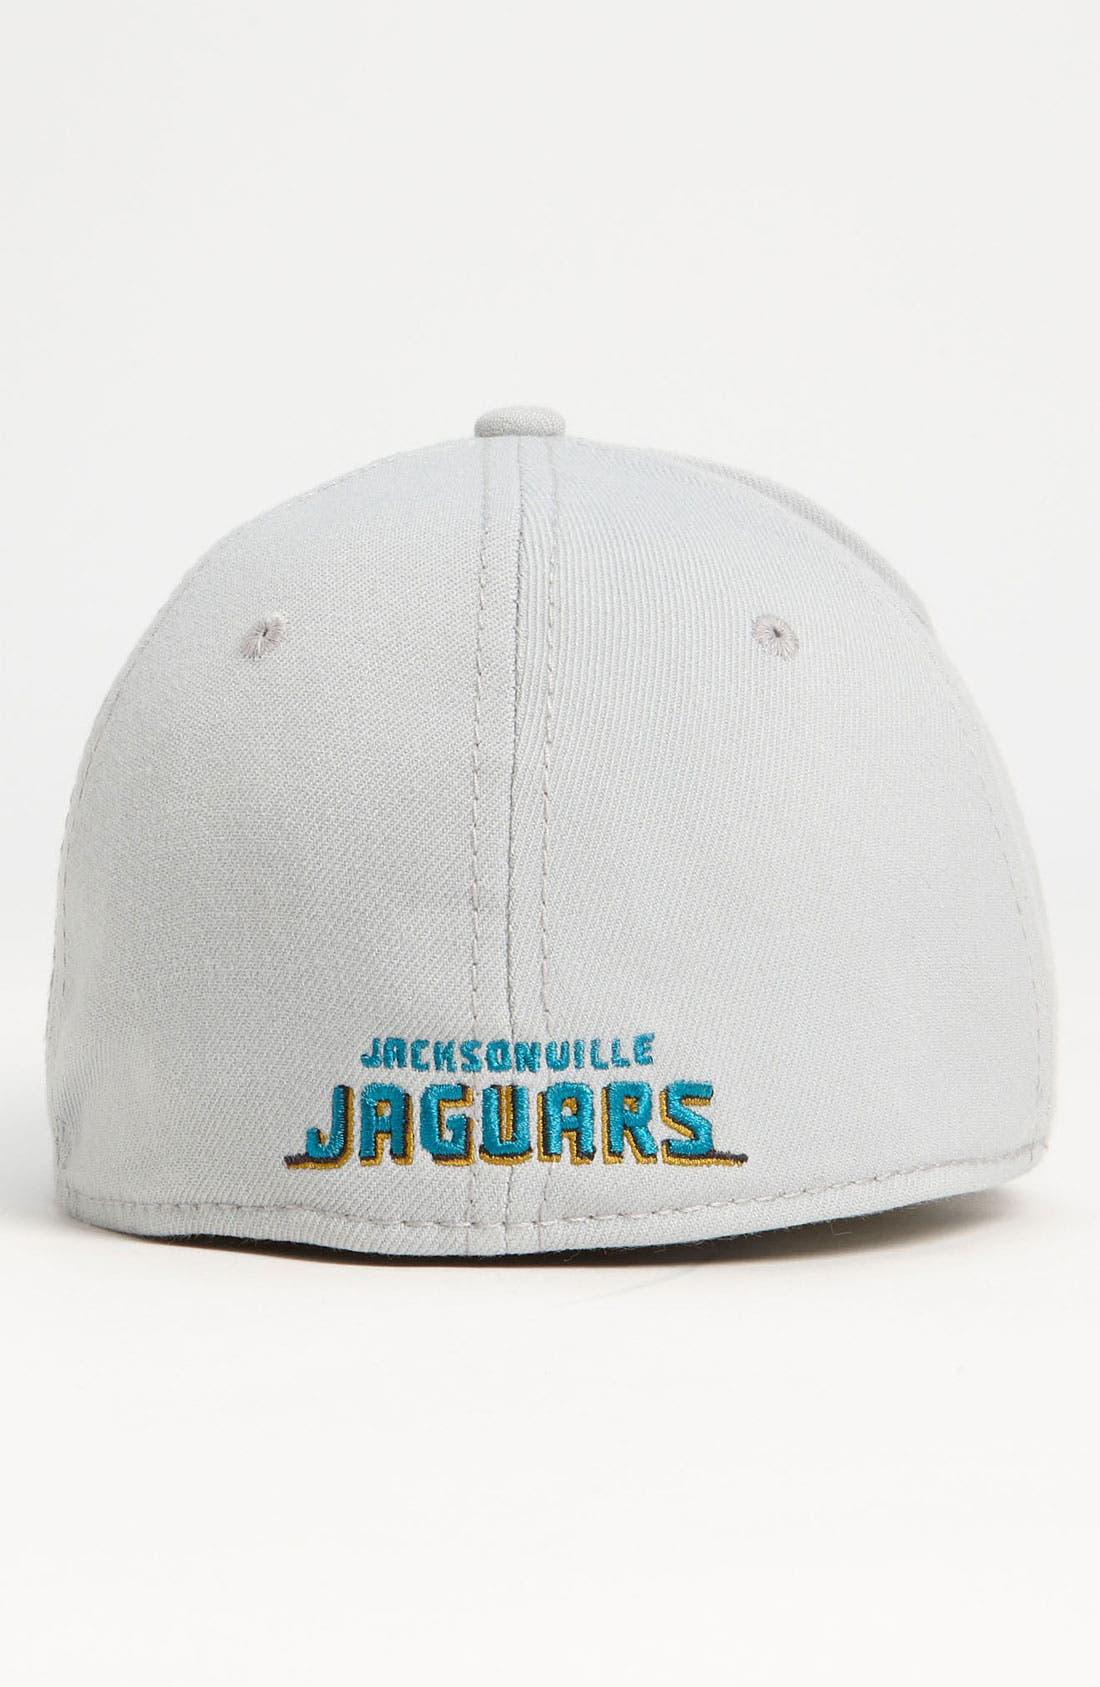 Alternate Image 2  - New Era Cap 'NFL Draft - Jacksonville Jaguars' Baseball Cap